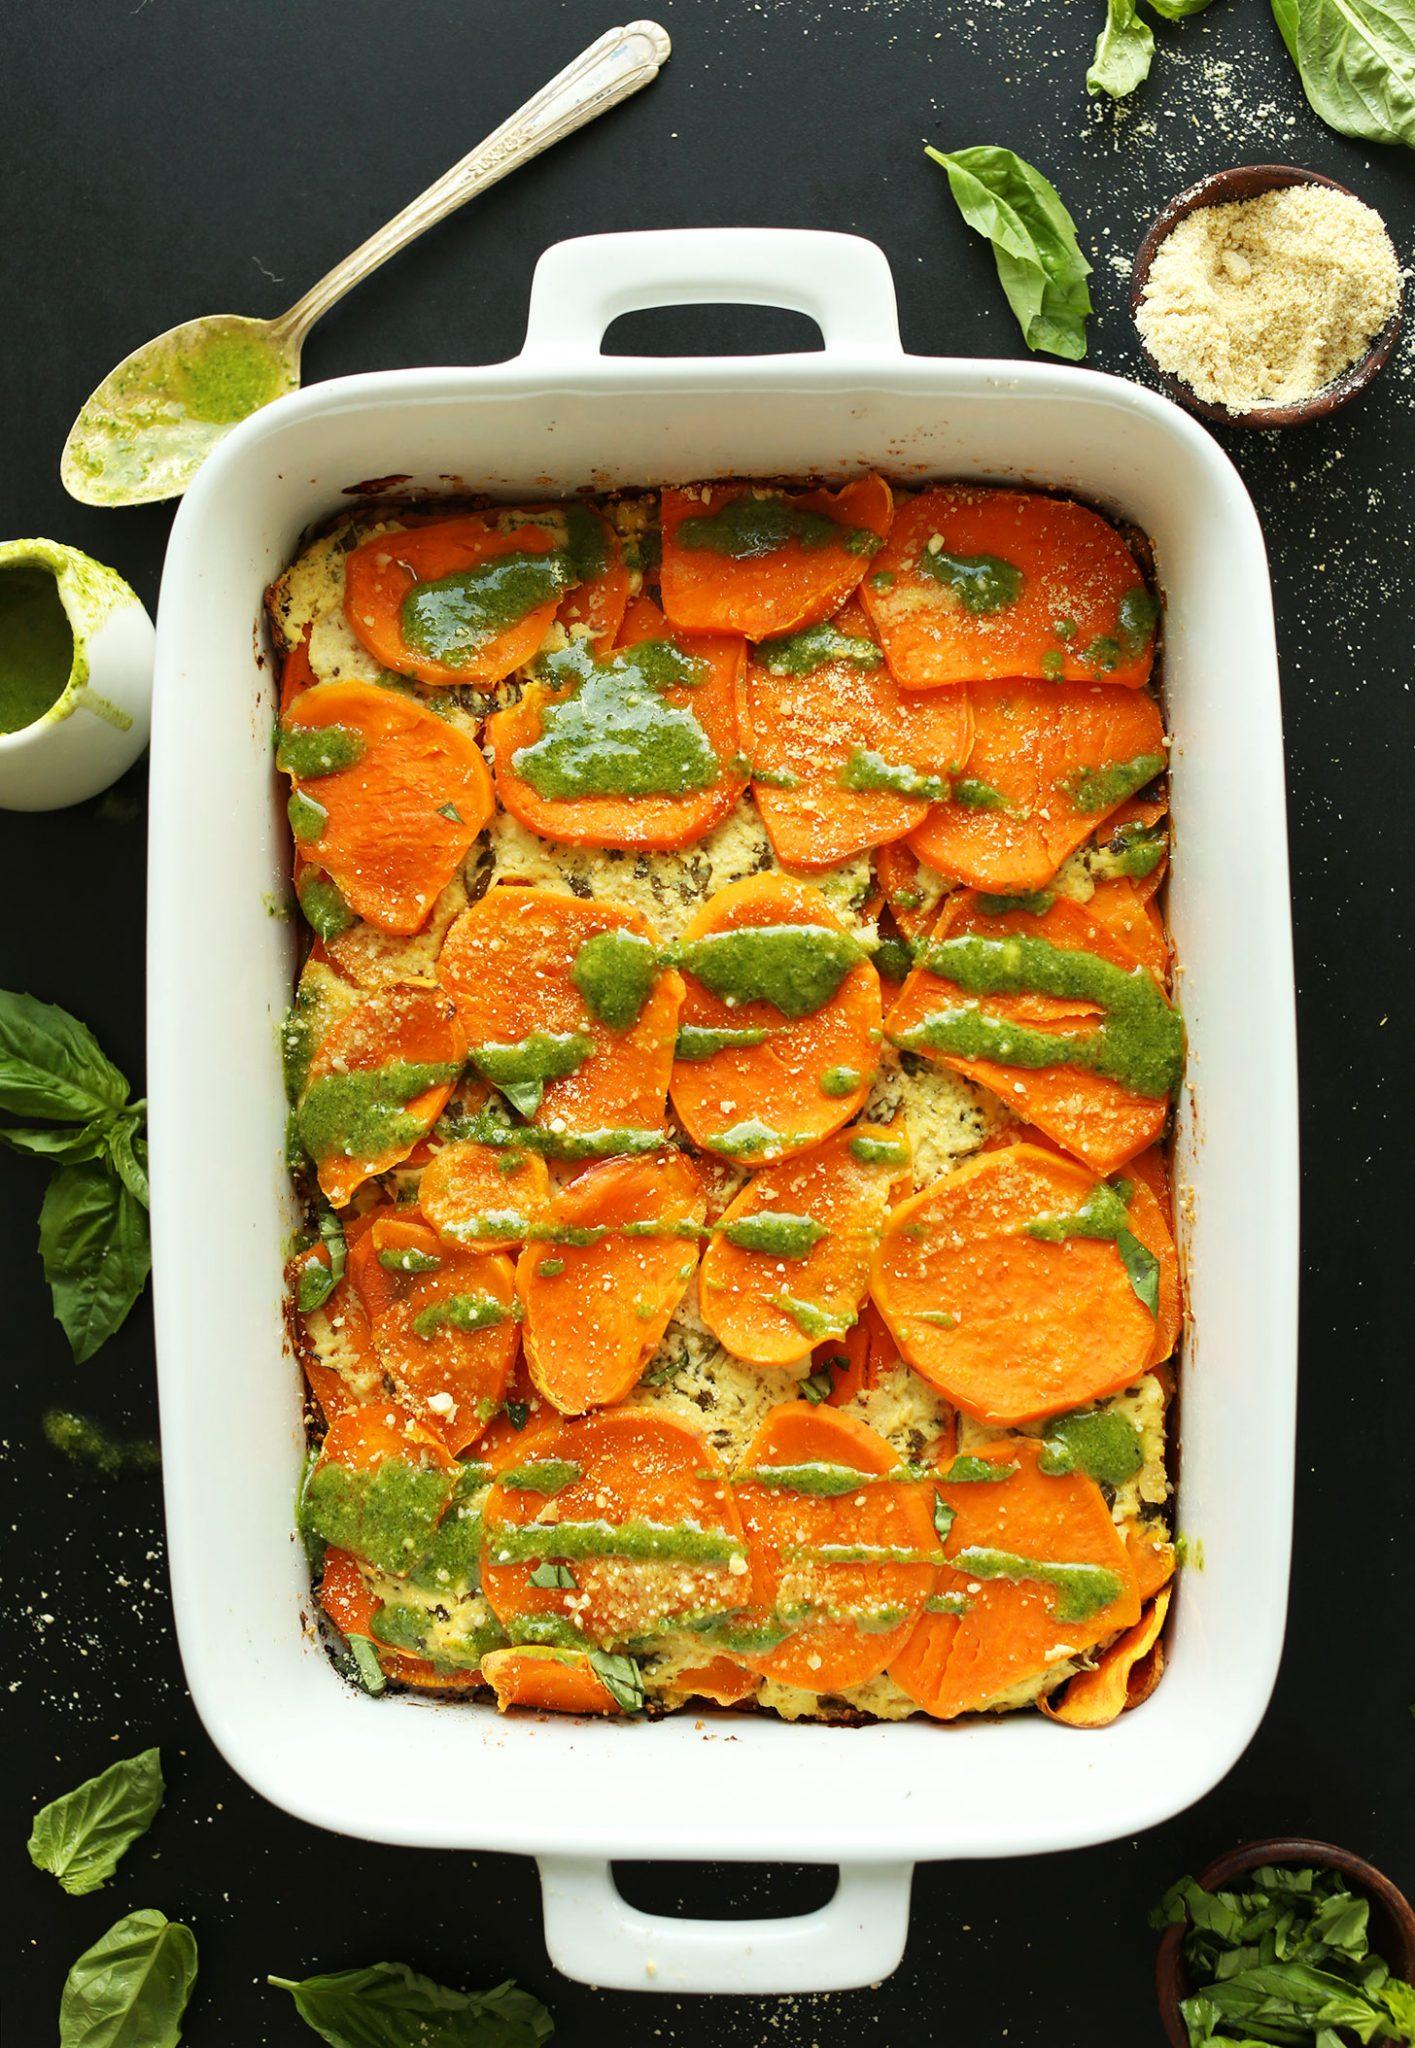 Vegan-Sweet-Potato-Lasagna-9-ingredients-simple-methods-BIG-flavor-healthy-vegan-glutenfree-lasagna-recipe-dinner-minimalistbaker